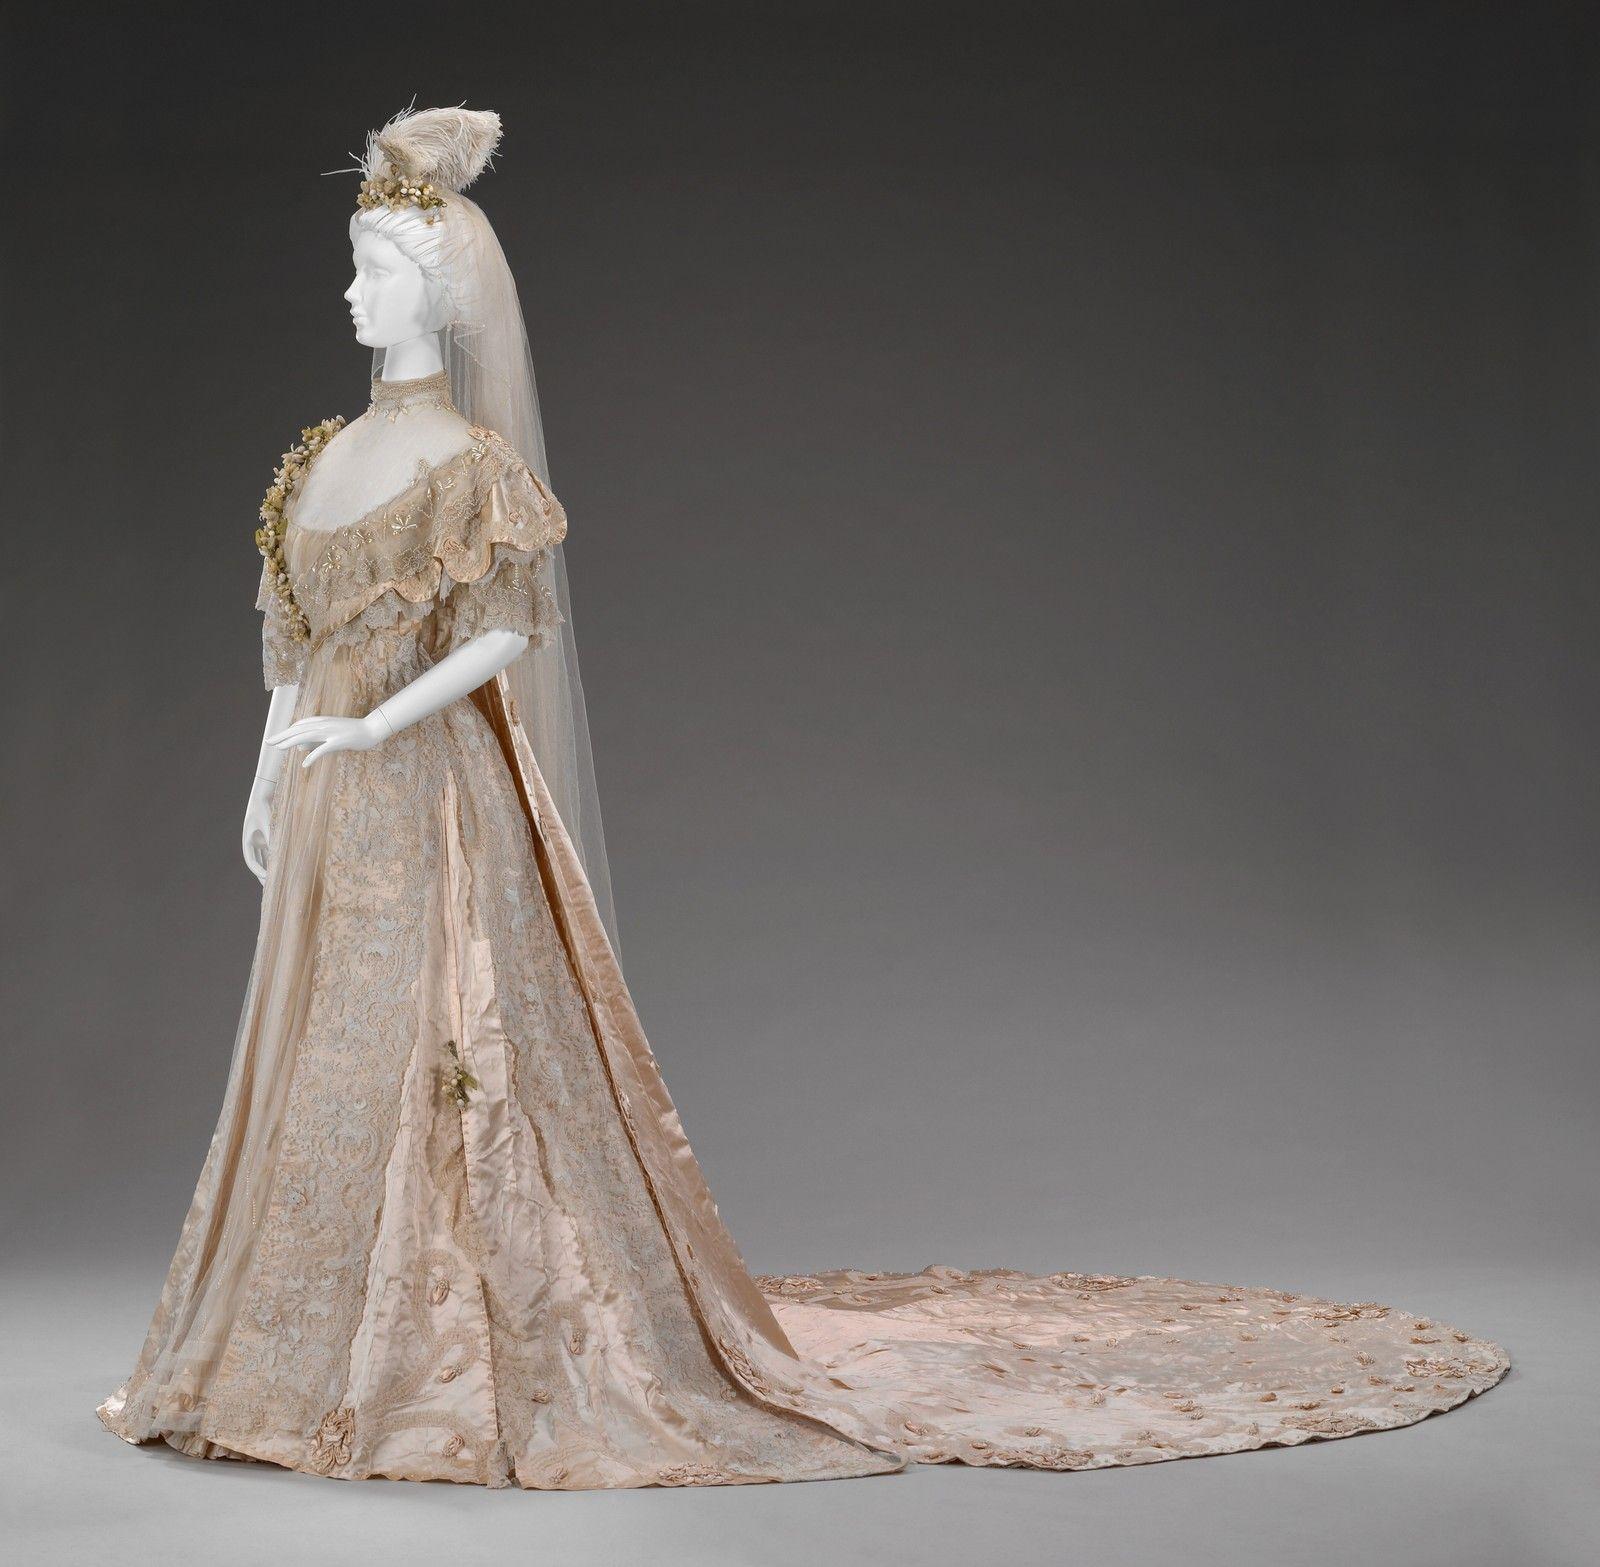 "Girolamo Giuseffi (American, 1864-1934), ""Wedding Dress"